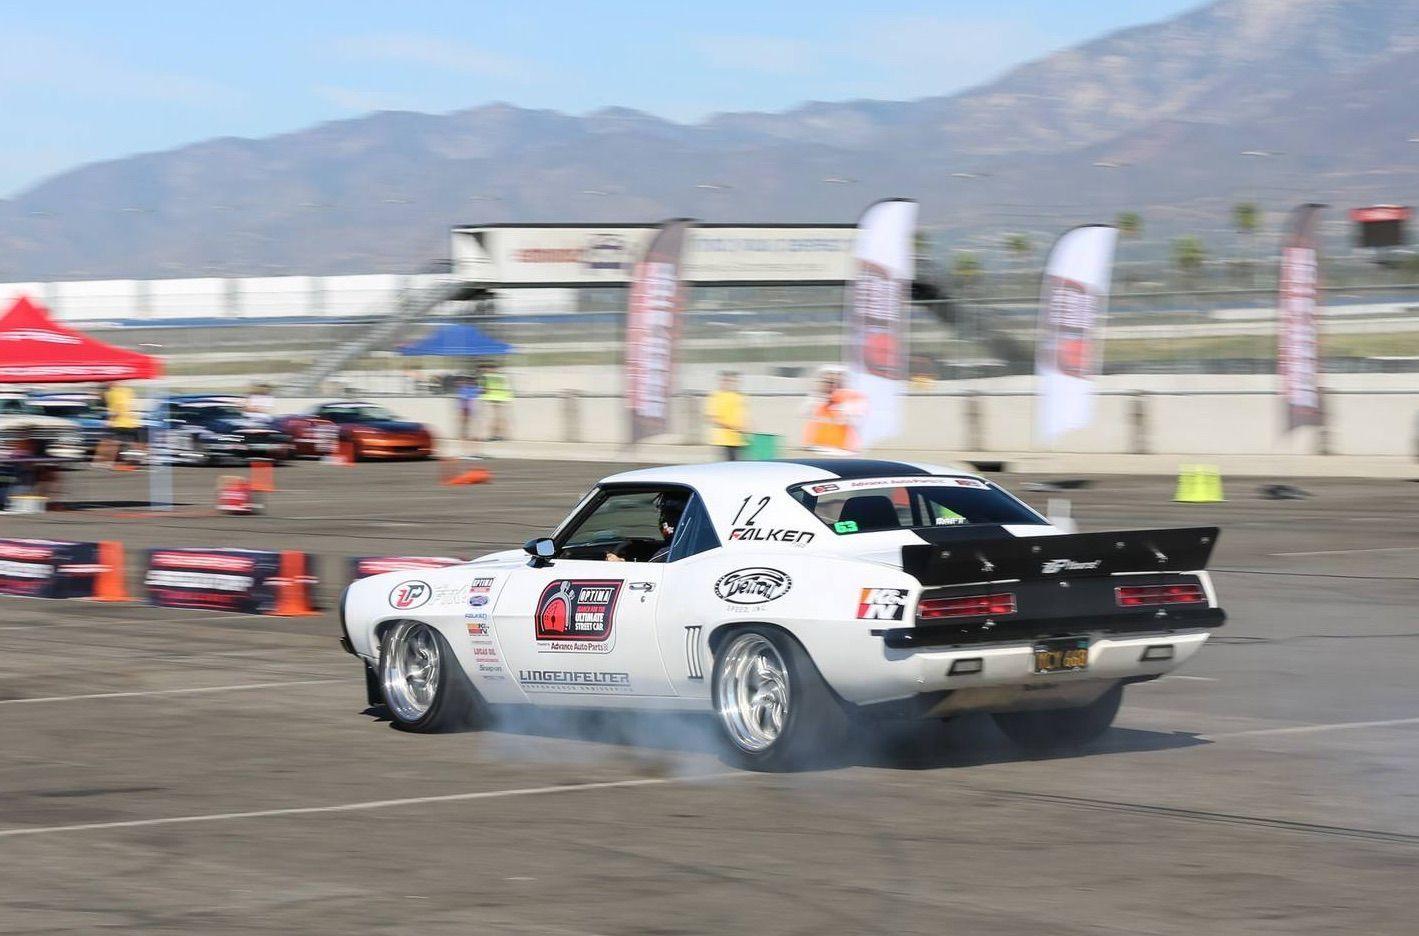 1969 Chevrolet Camaro | Jake Rozelle Wins GTV Class at USCA Fontana and Clinches 2016 GTV Season Points Championship